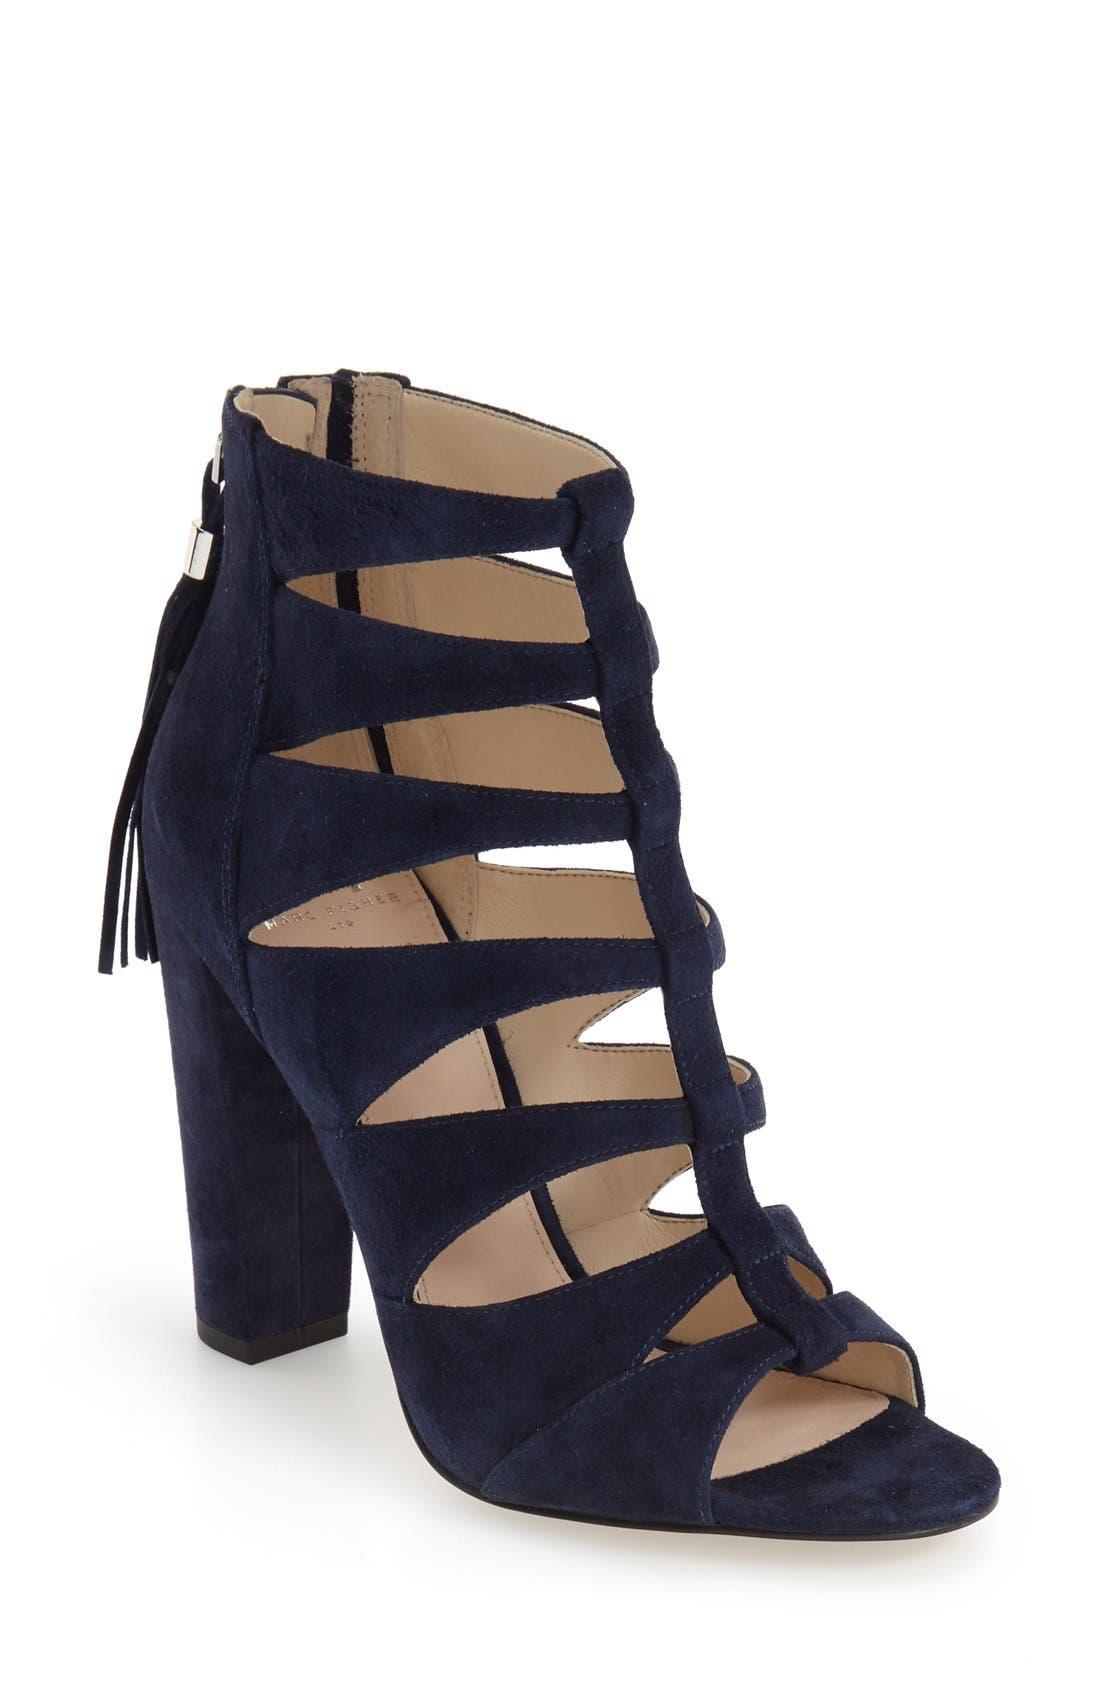 Alternate Image 1 Selected - Marc Fisher LTD 'Hindera' Gladiator Sandal (Women)